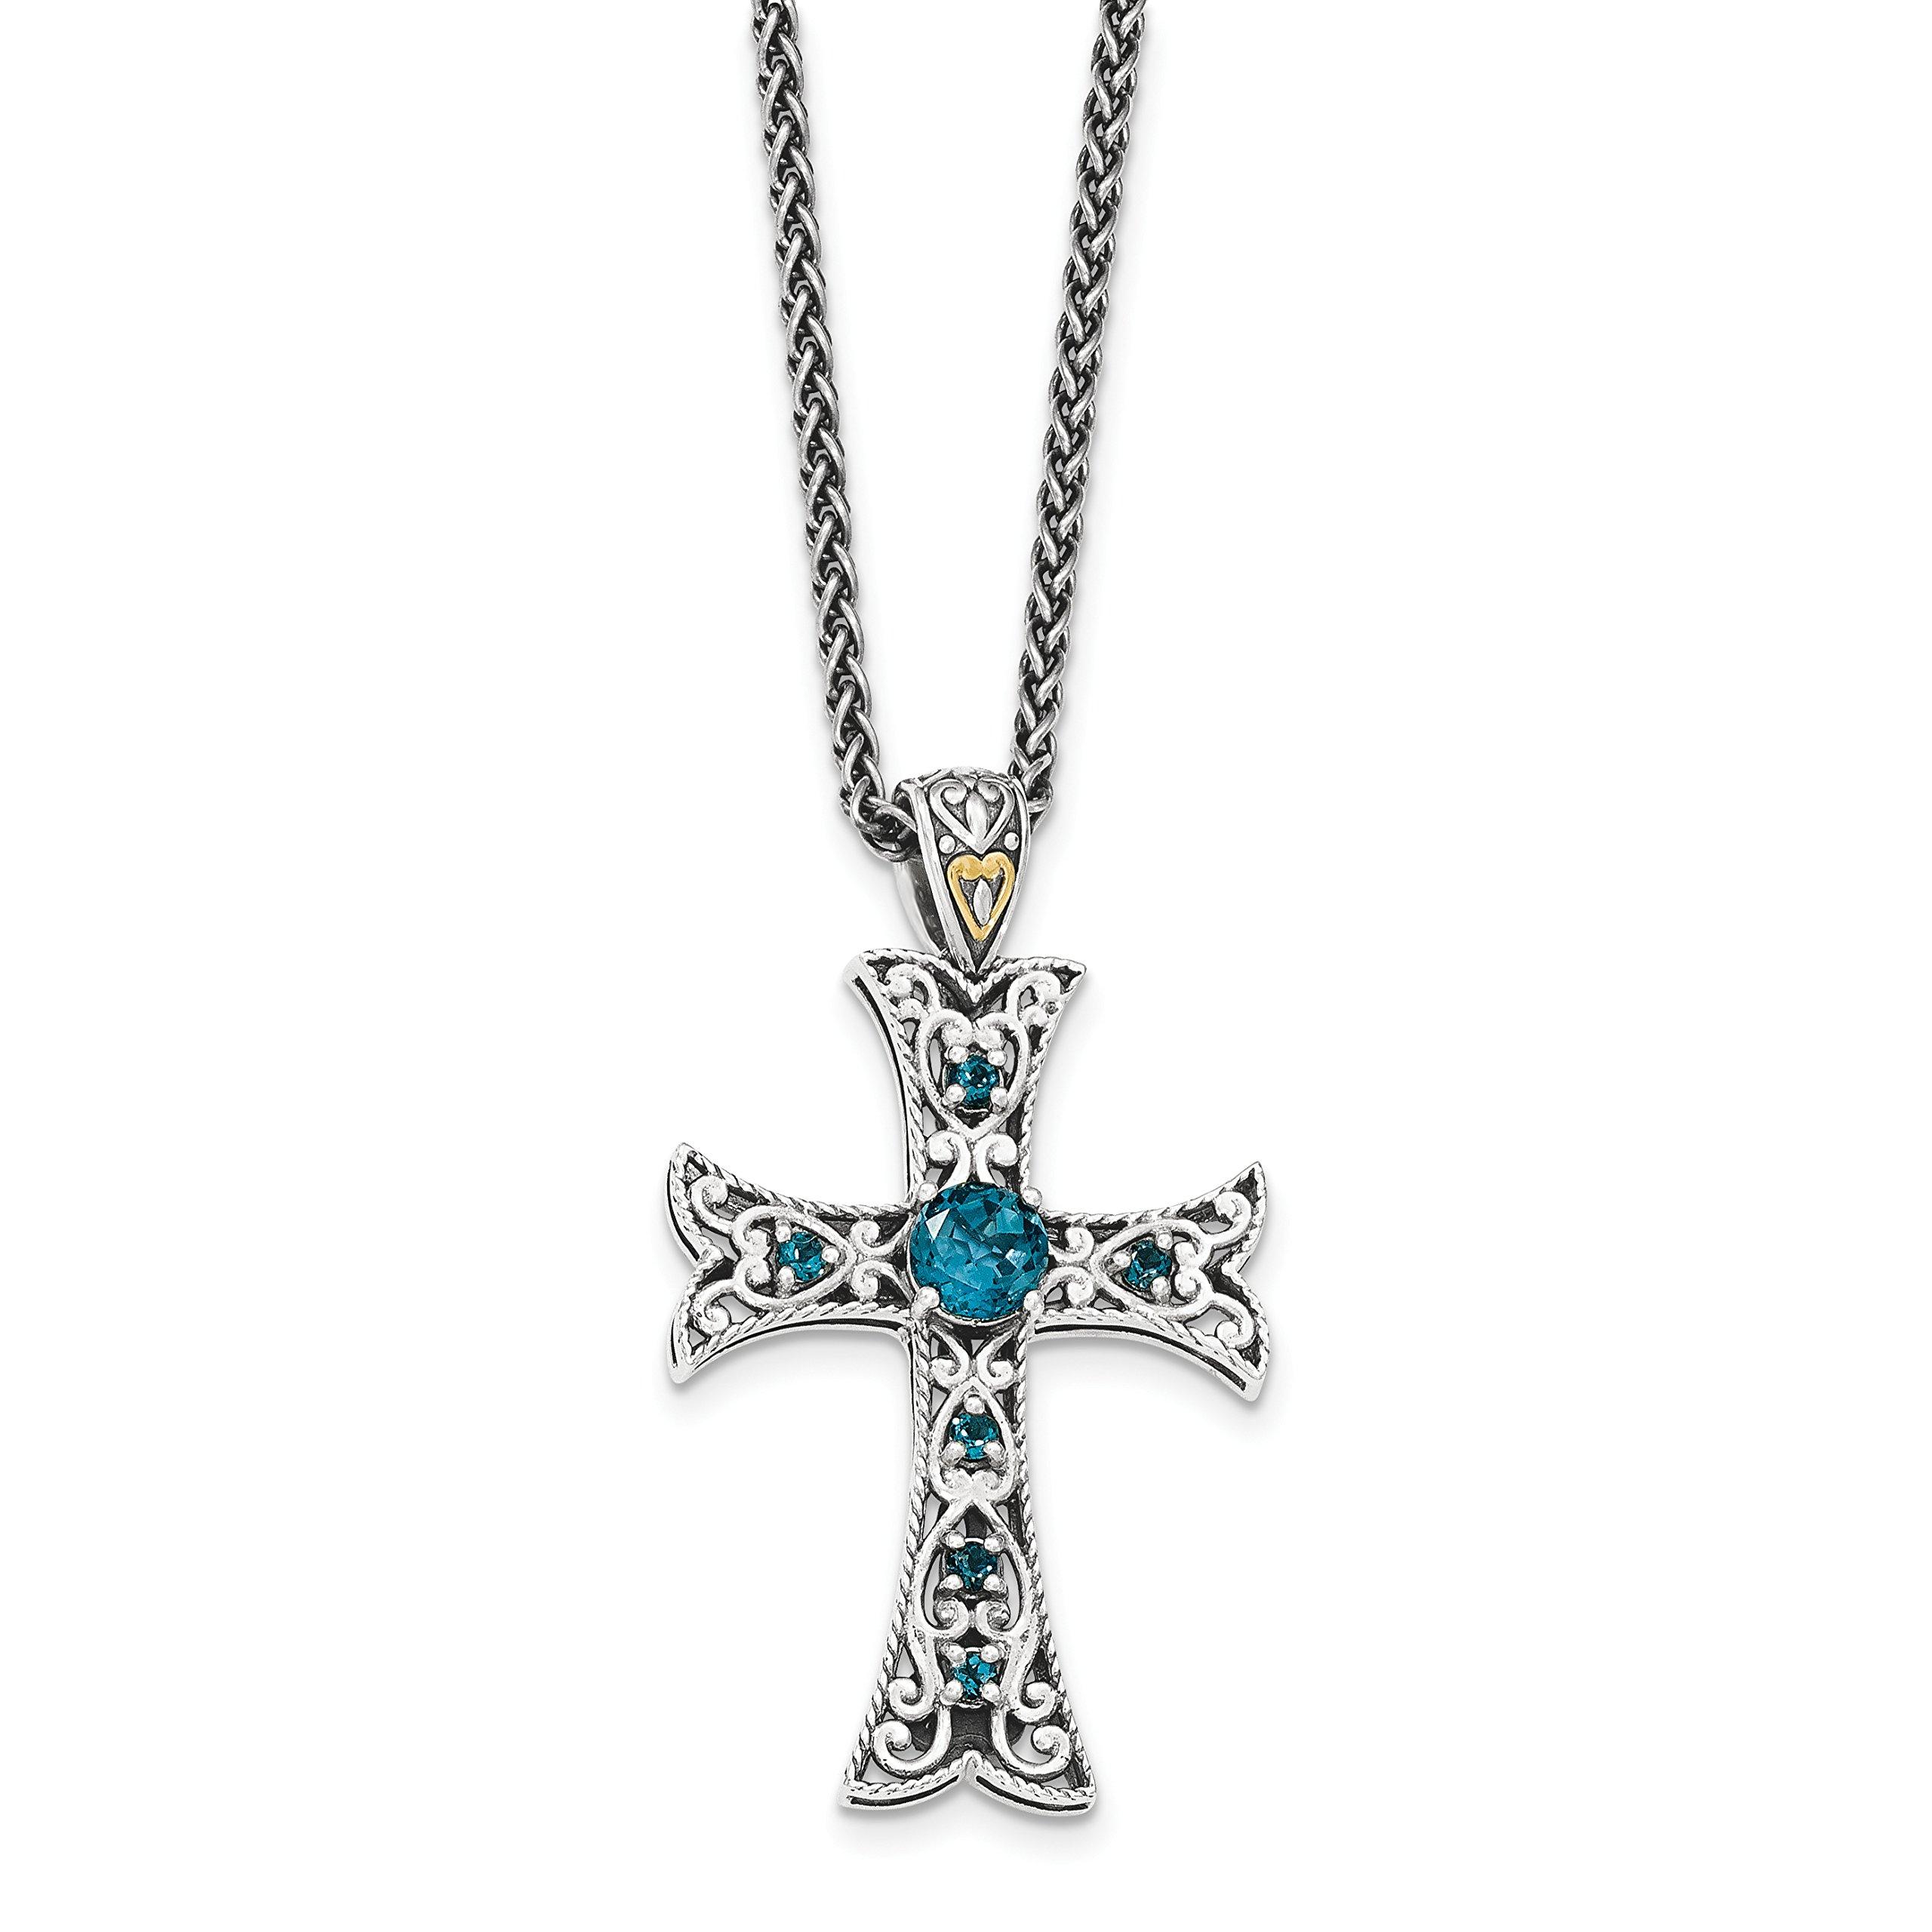 ICE CARATS 925 Sterling Silver 14k London Blue Topaz Cross Religious Chain Necklace Gemstone Fancy Fine Jewelry Gift Set For Women Heart